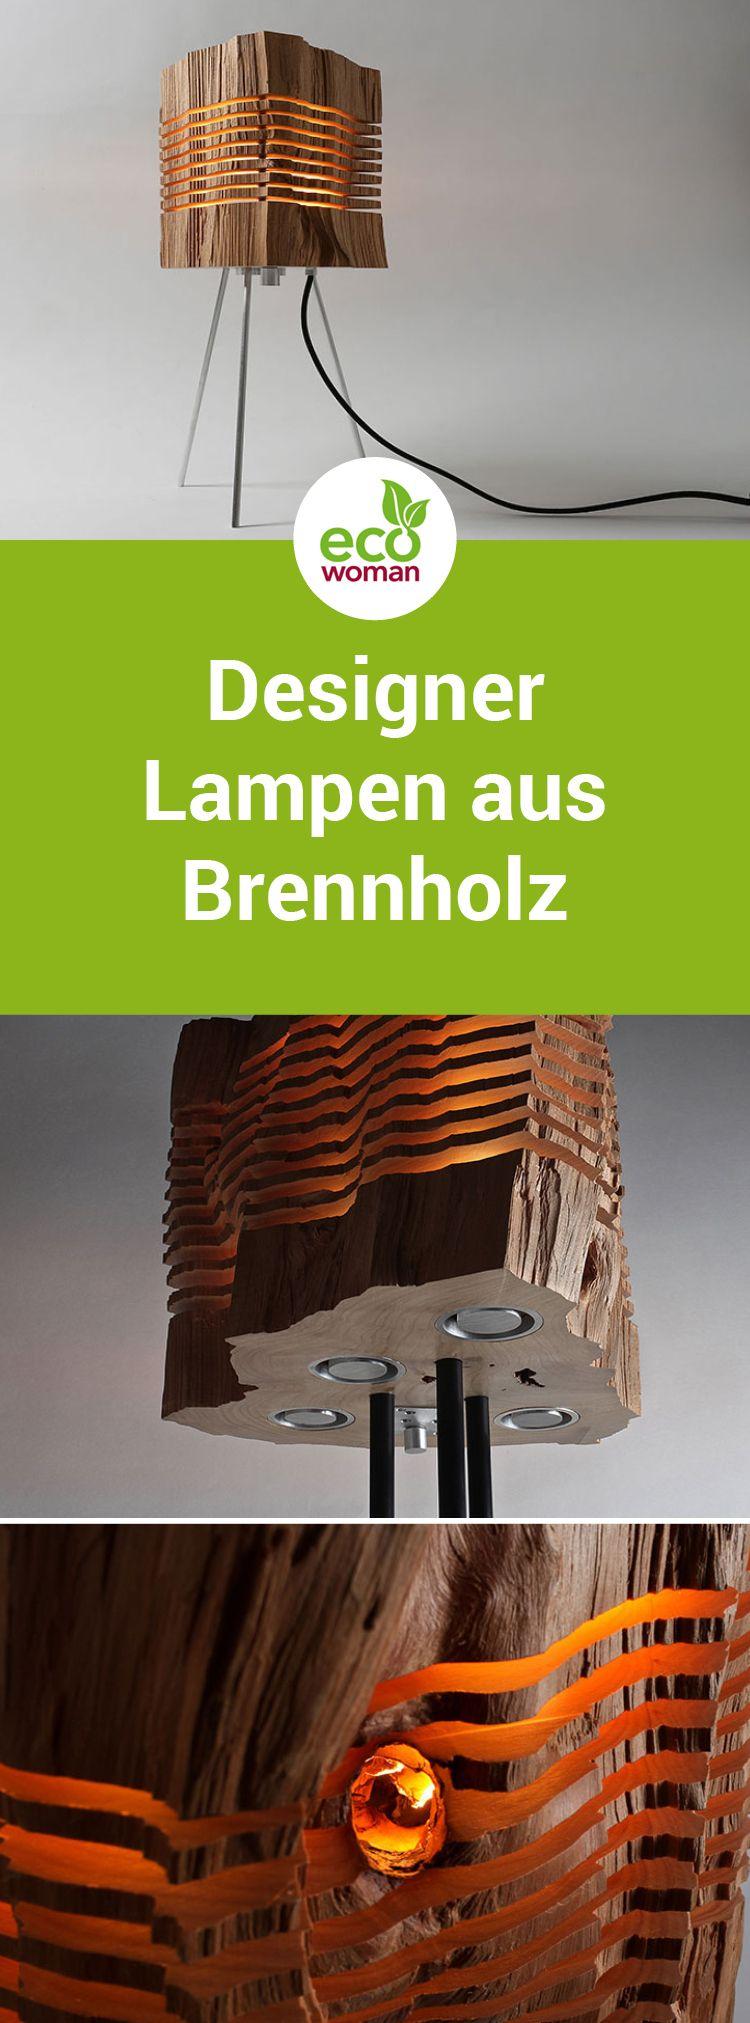 Upcycling Designer Lampen aus Brennholz gebaut Handarbeit